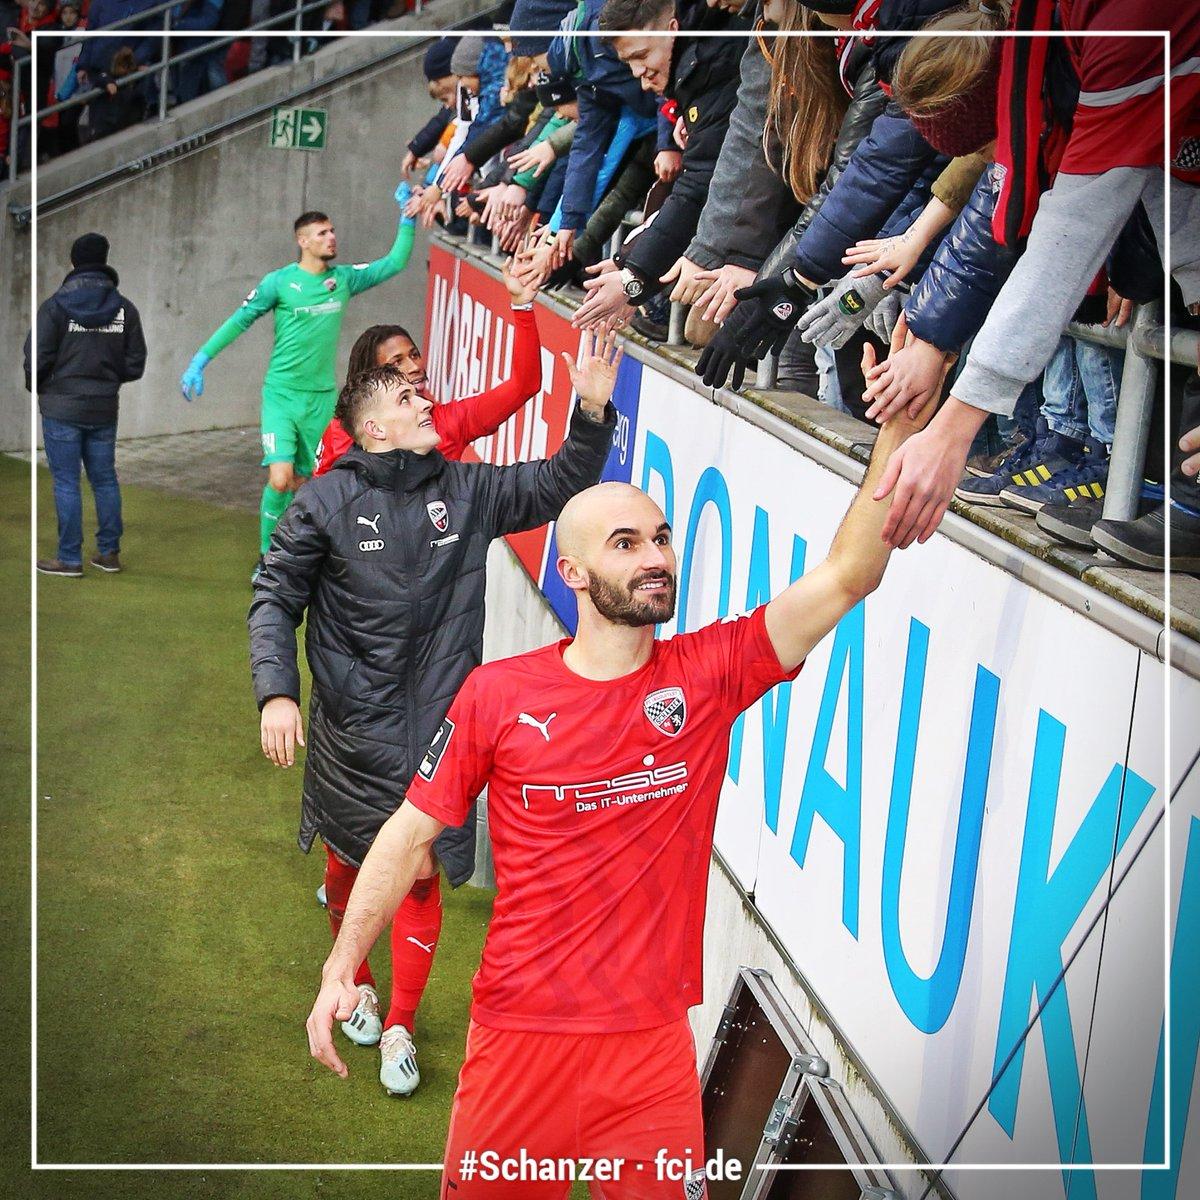 FC Ingolstadt 04 @Schanzer